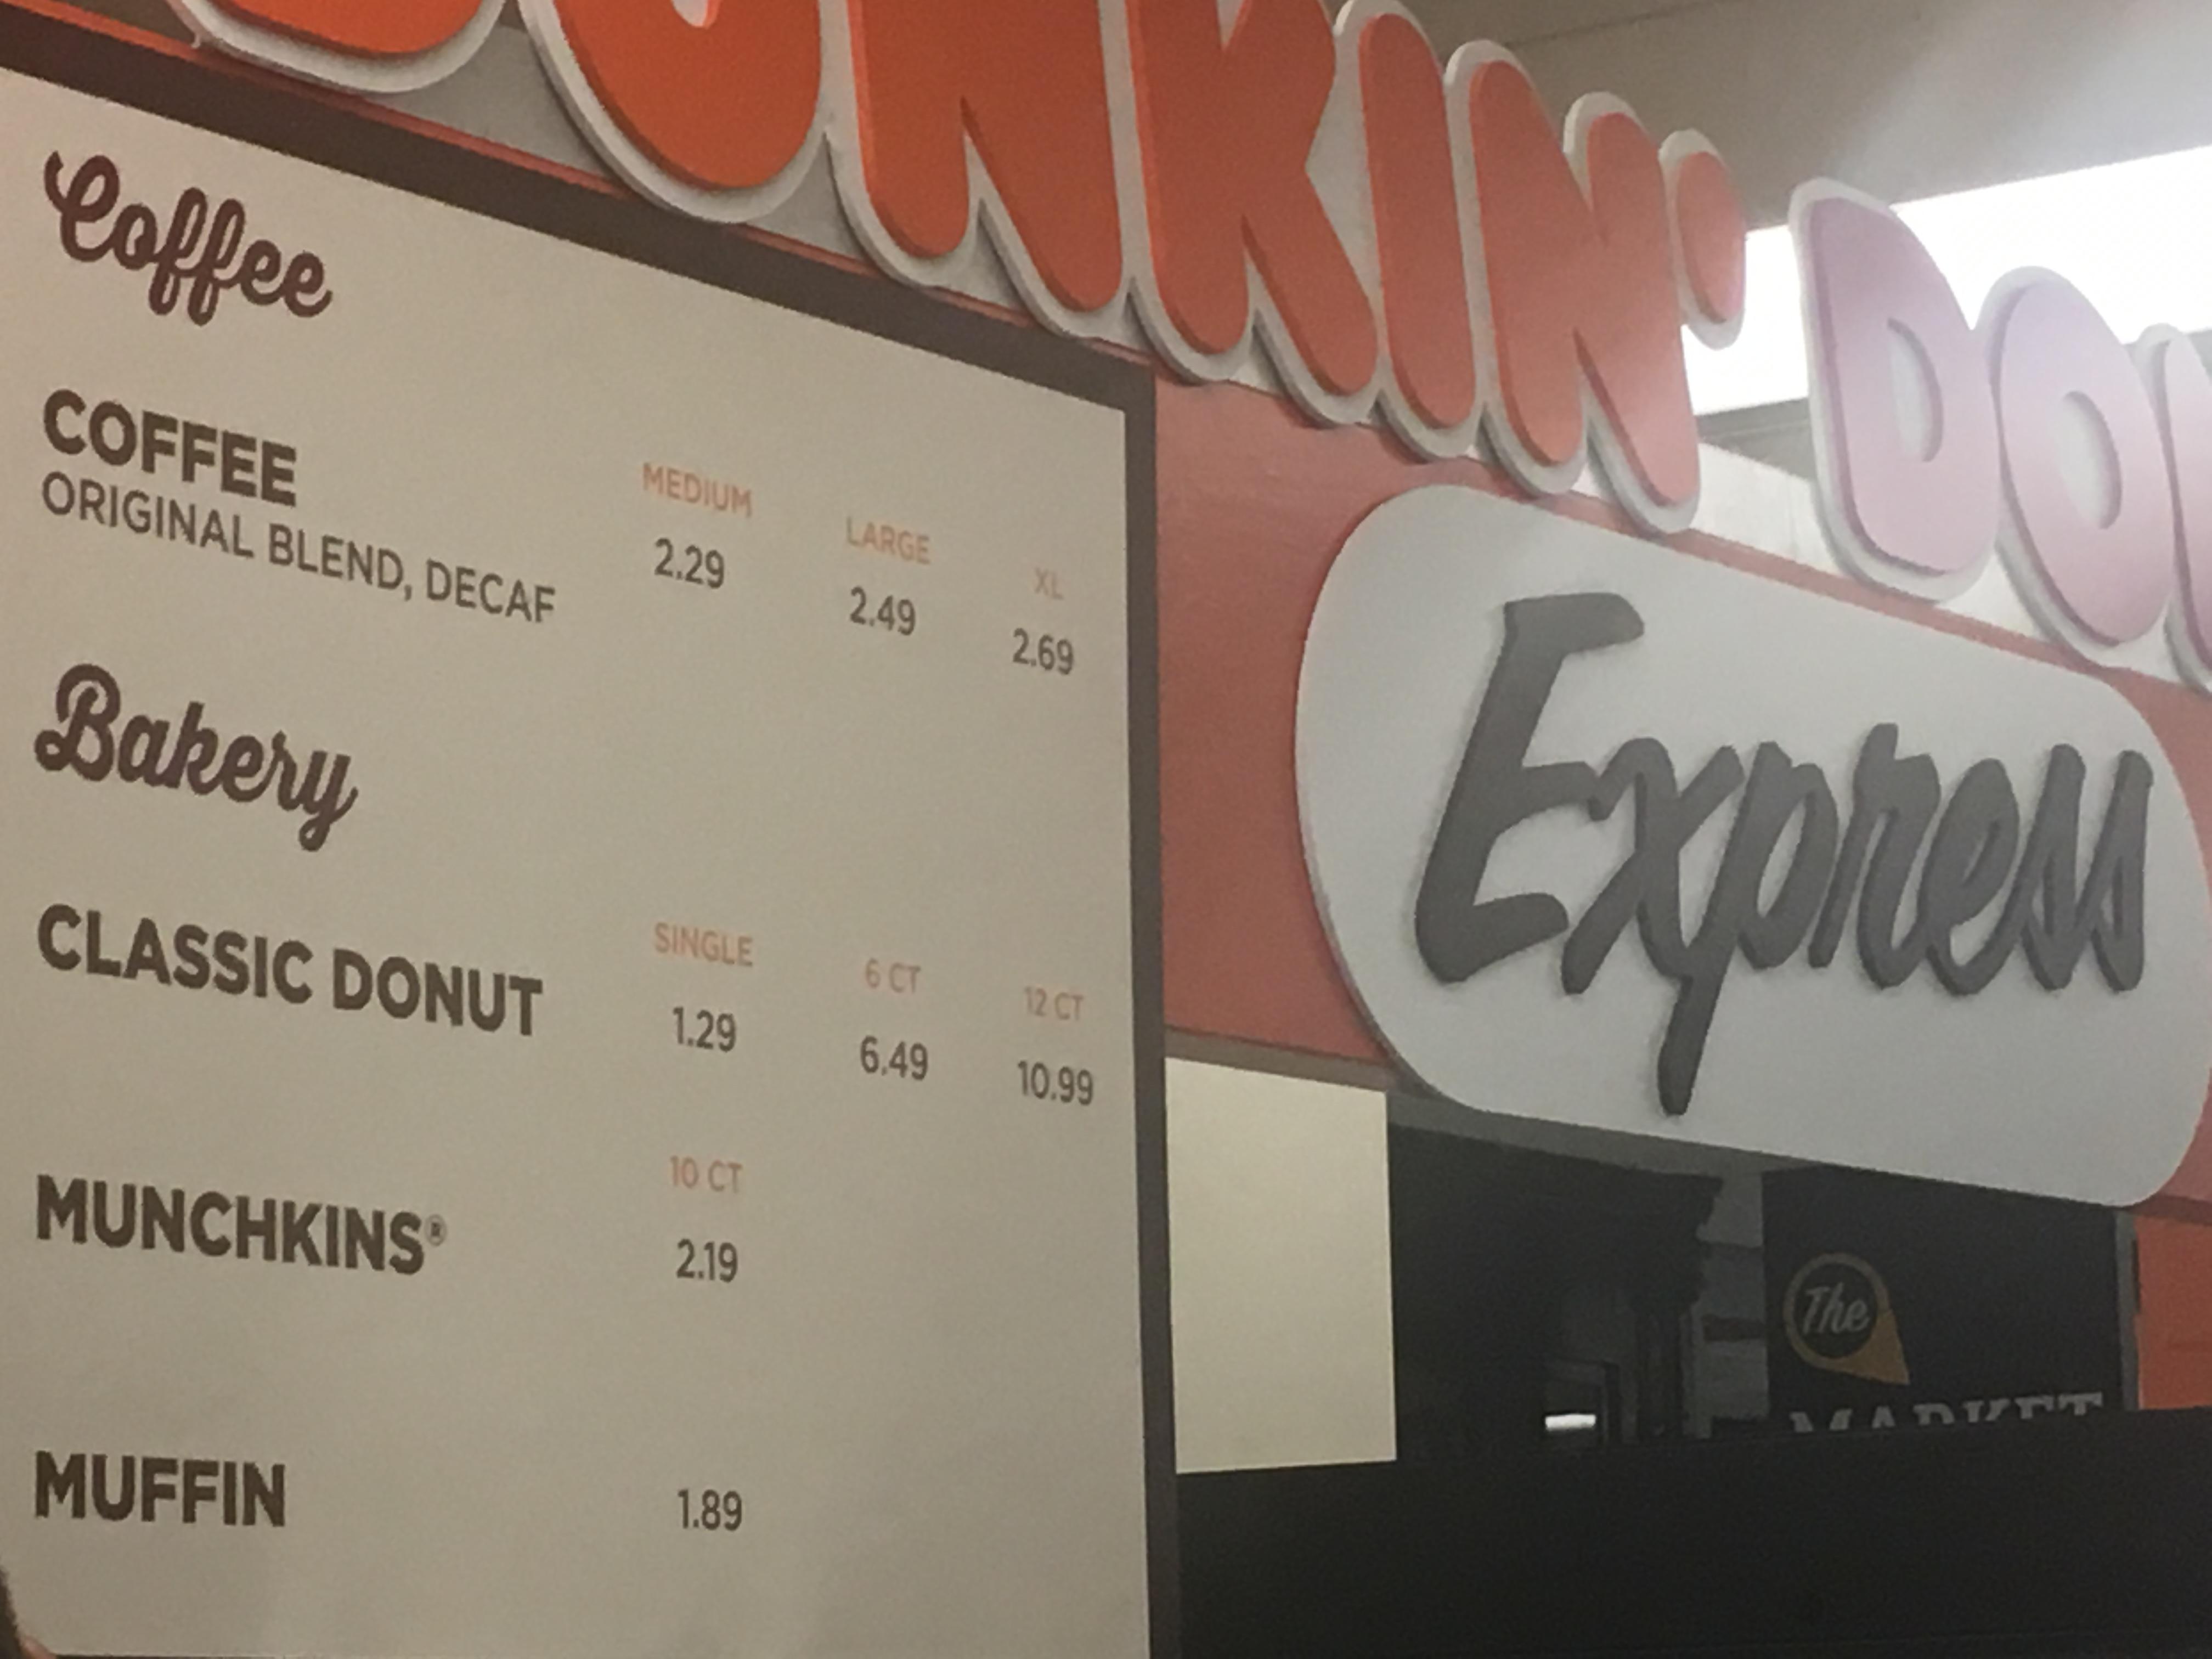 <div class='meta'><div class='origin-logo' data-origin='WLS'></div><span class='caption-text' data-credit=''>Dunkin Donuts Express menu</span></div>